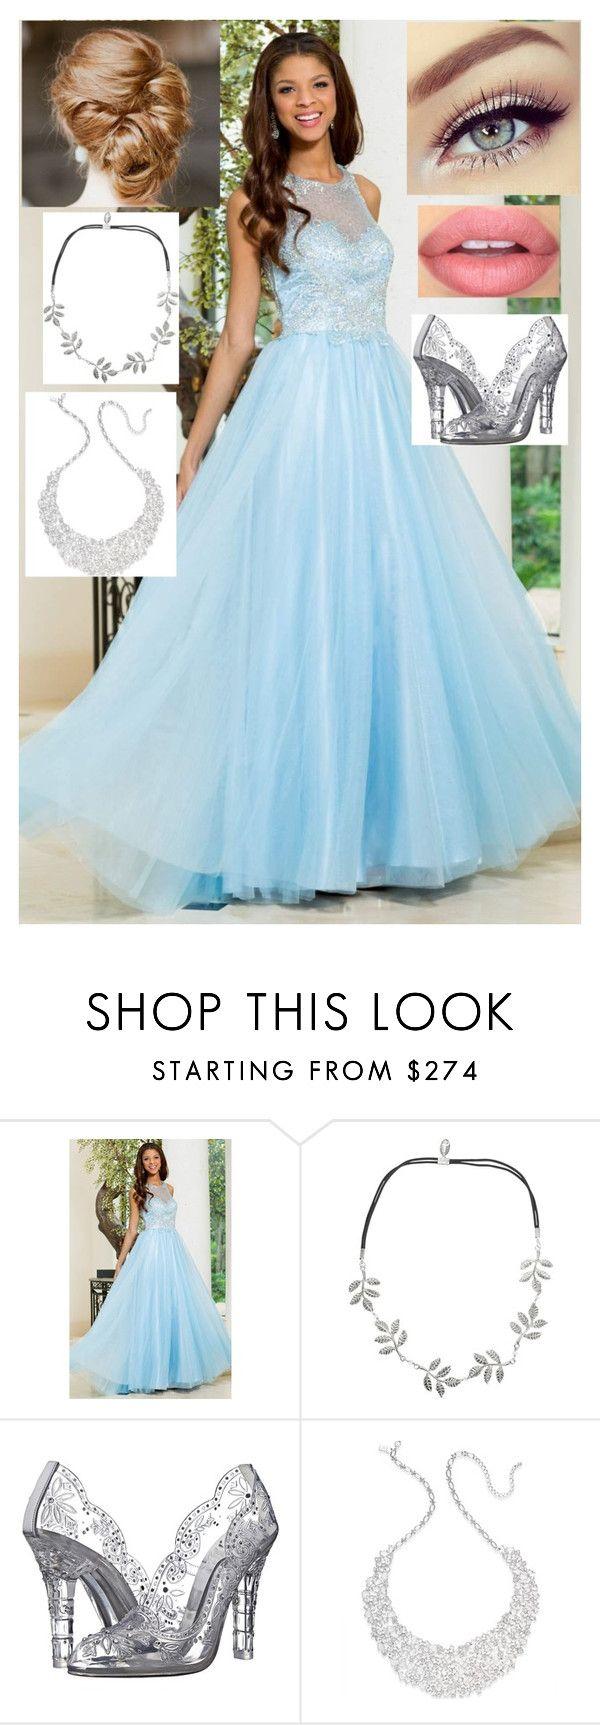 Cinderella Inspired Prom Dress Dresses Pinterest Prom Dresses